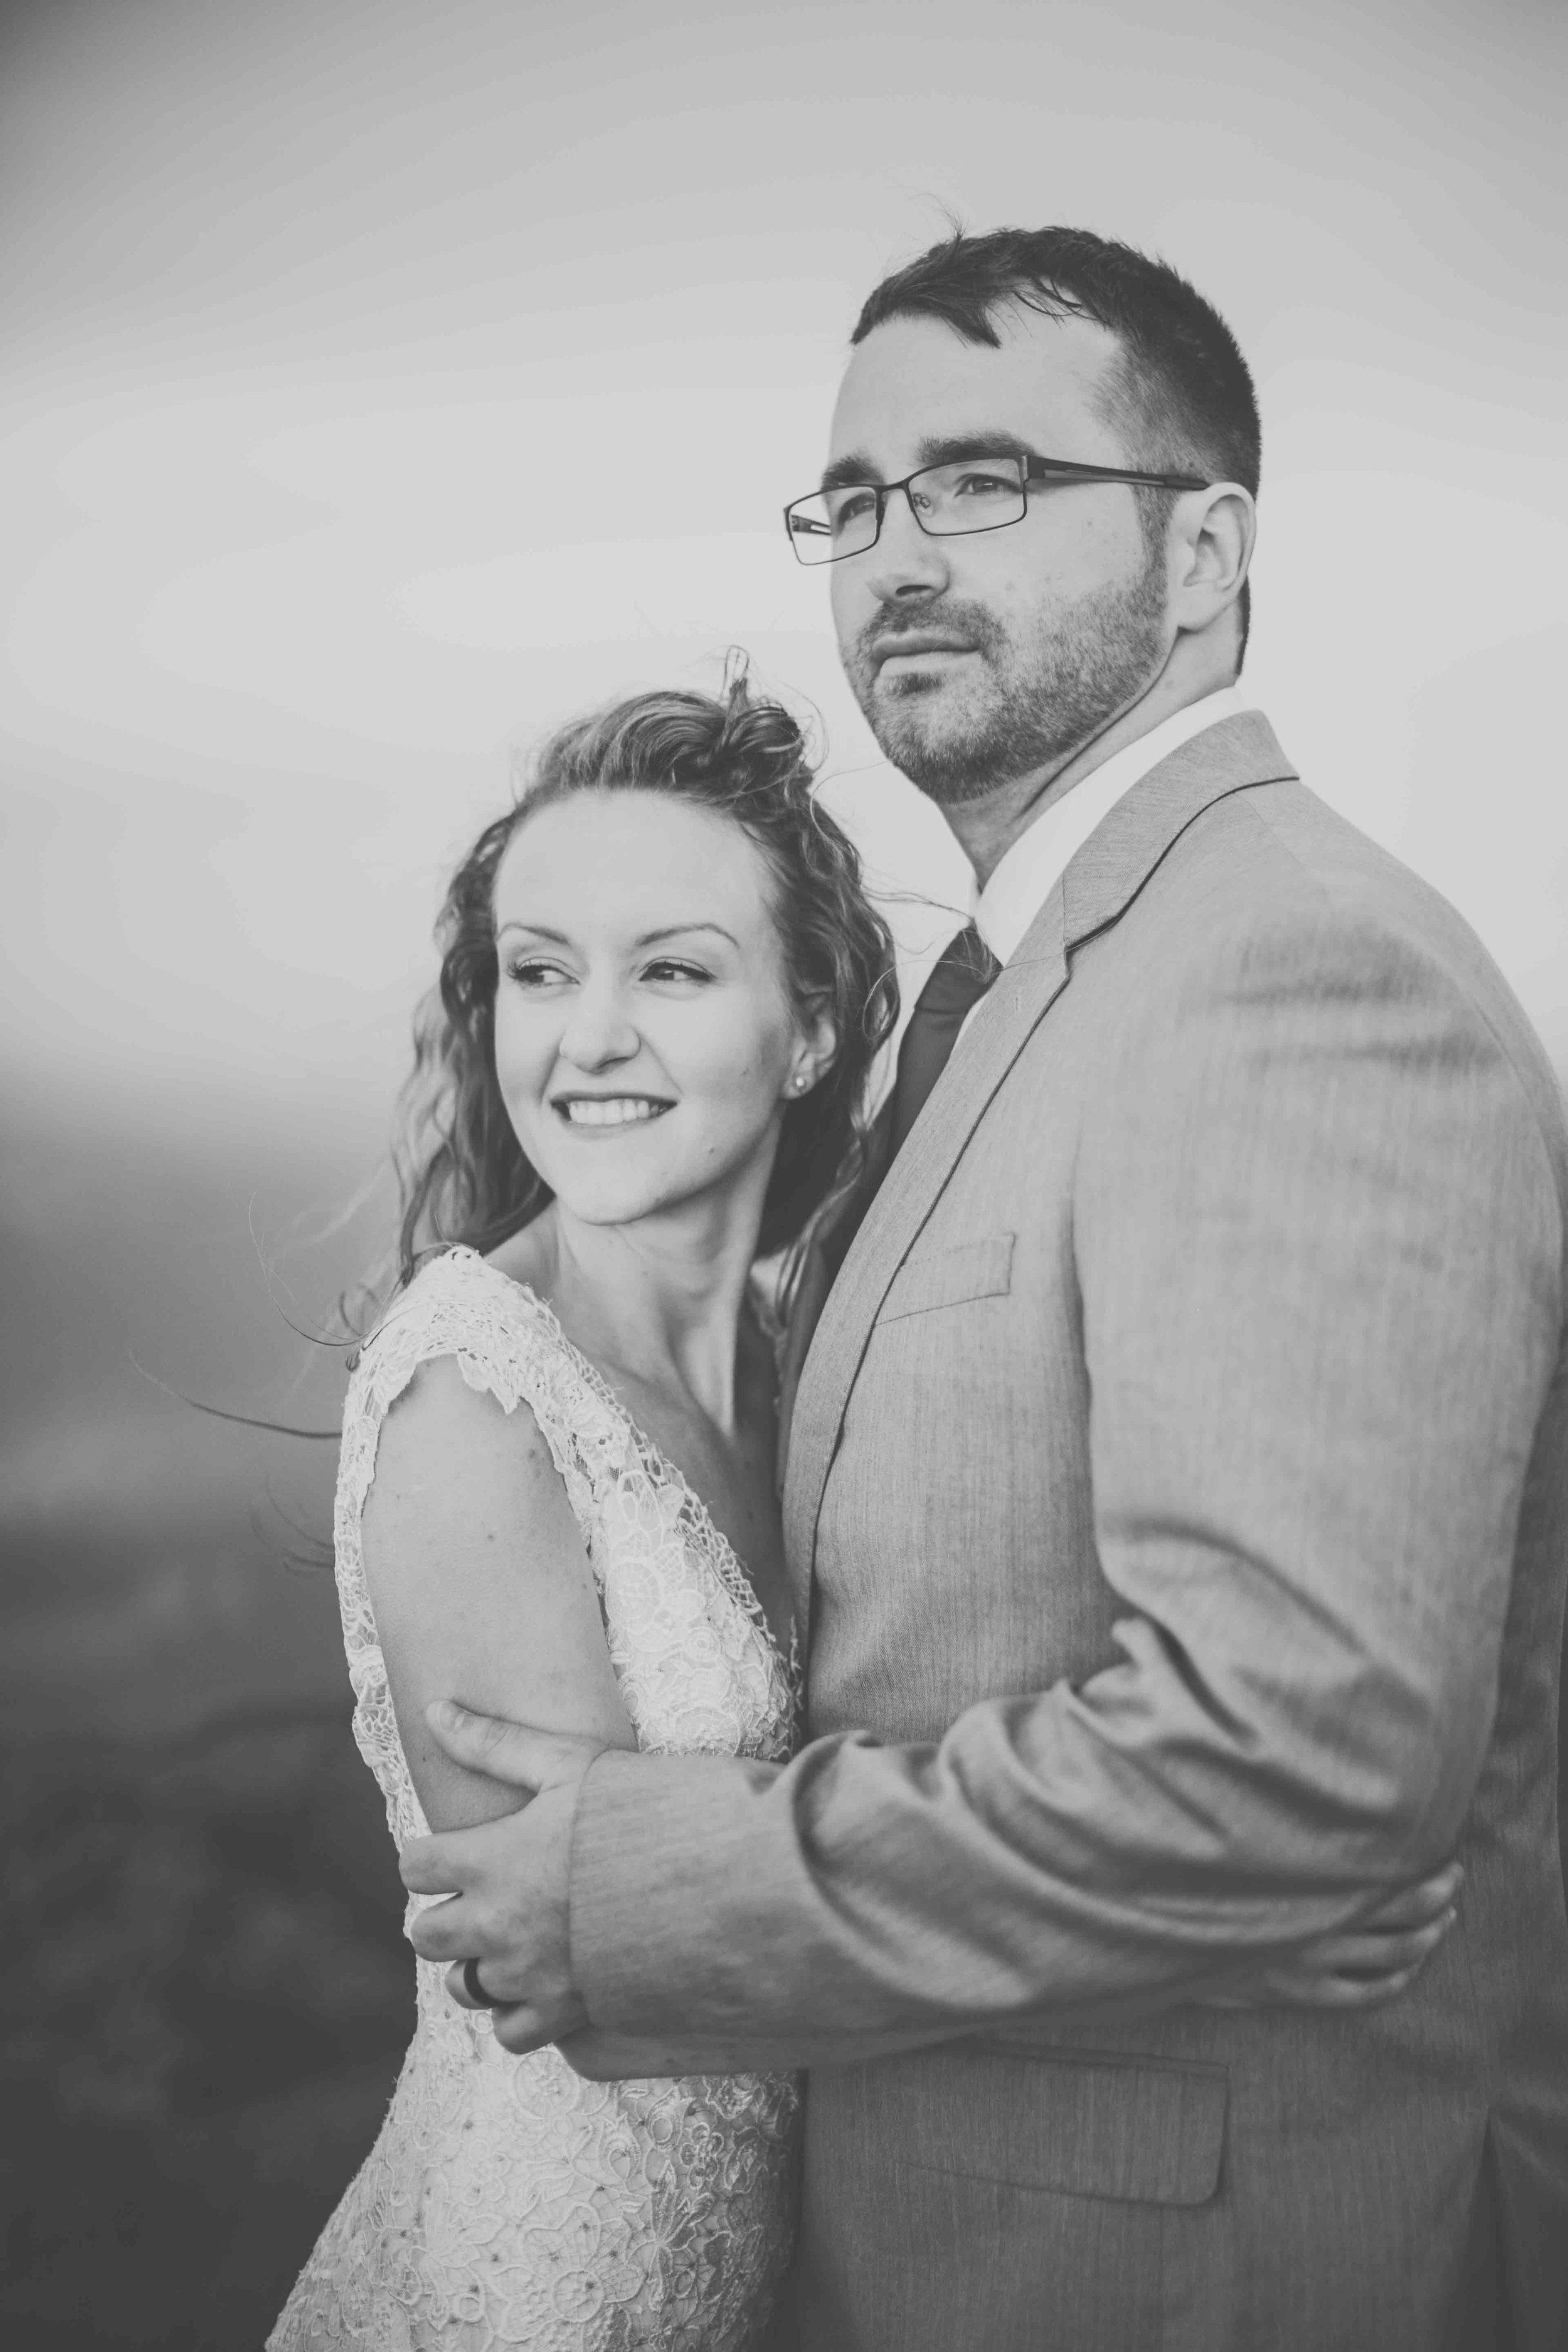 north-carolina-elopement-photographer-78.jpg